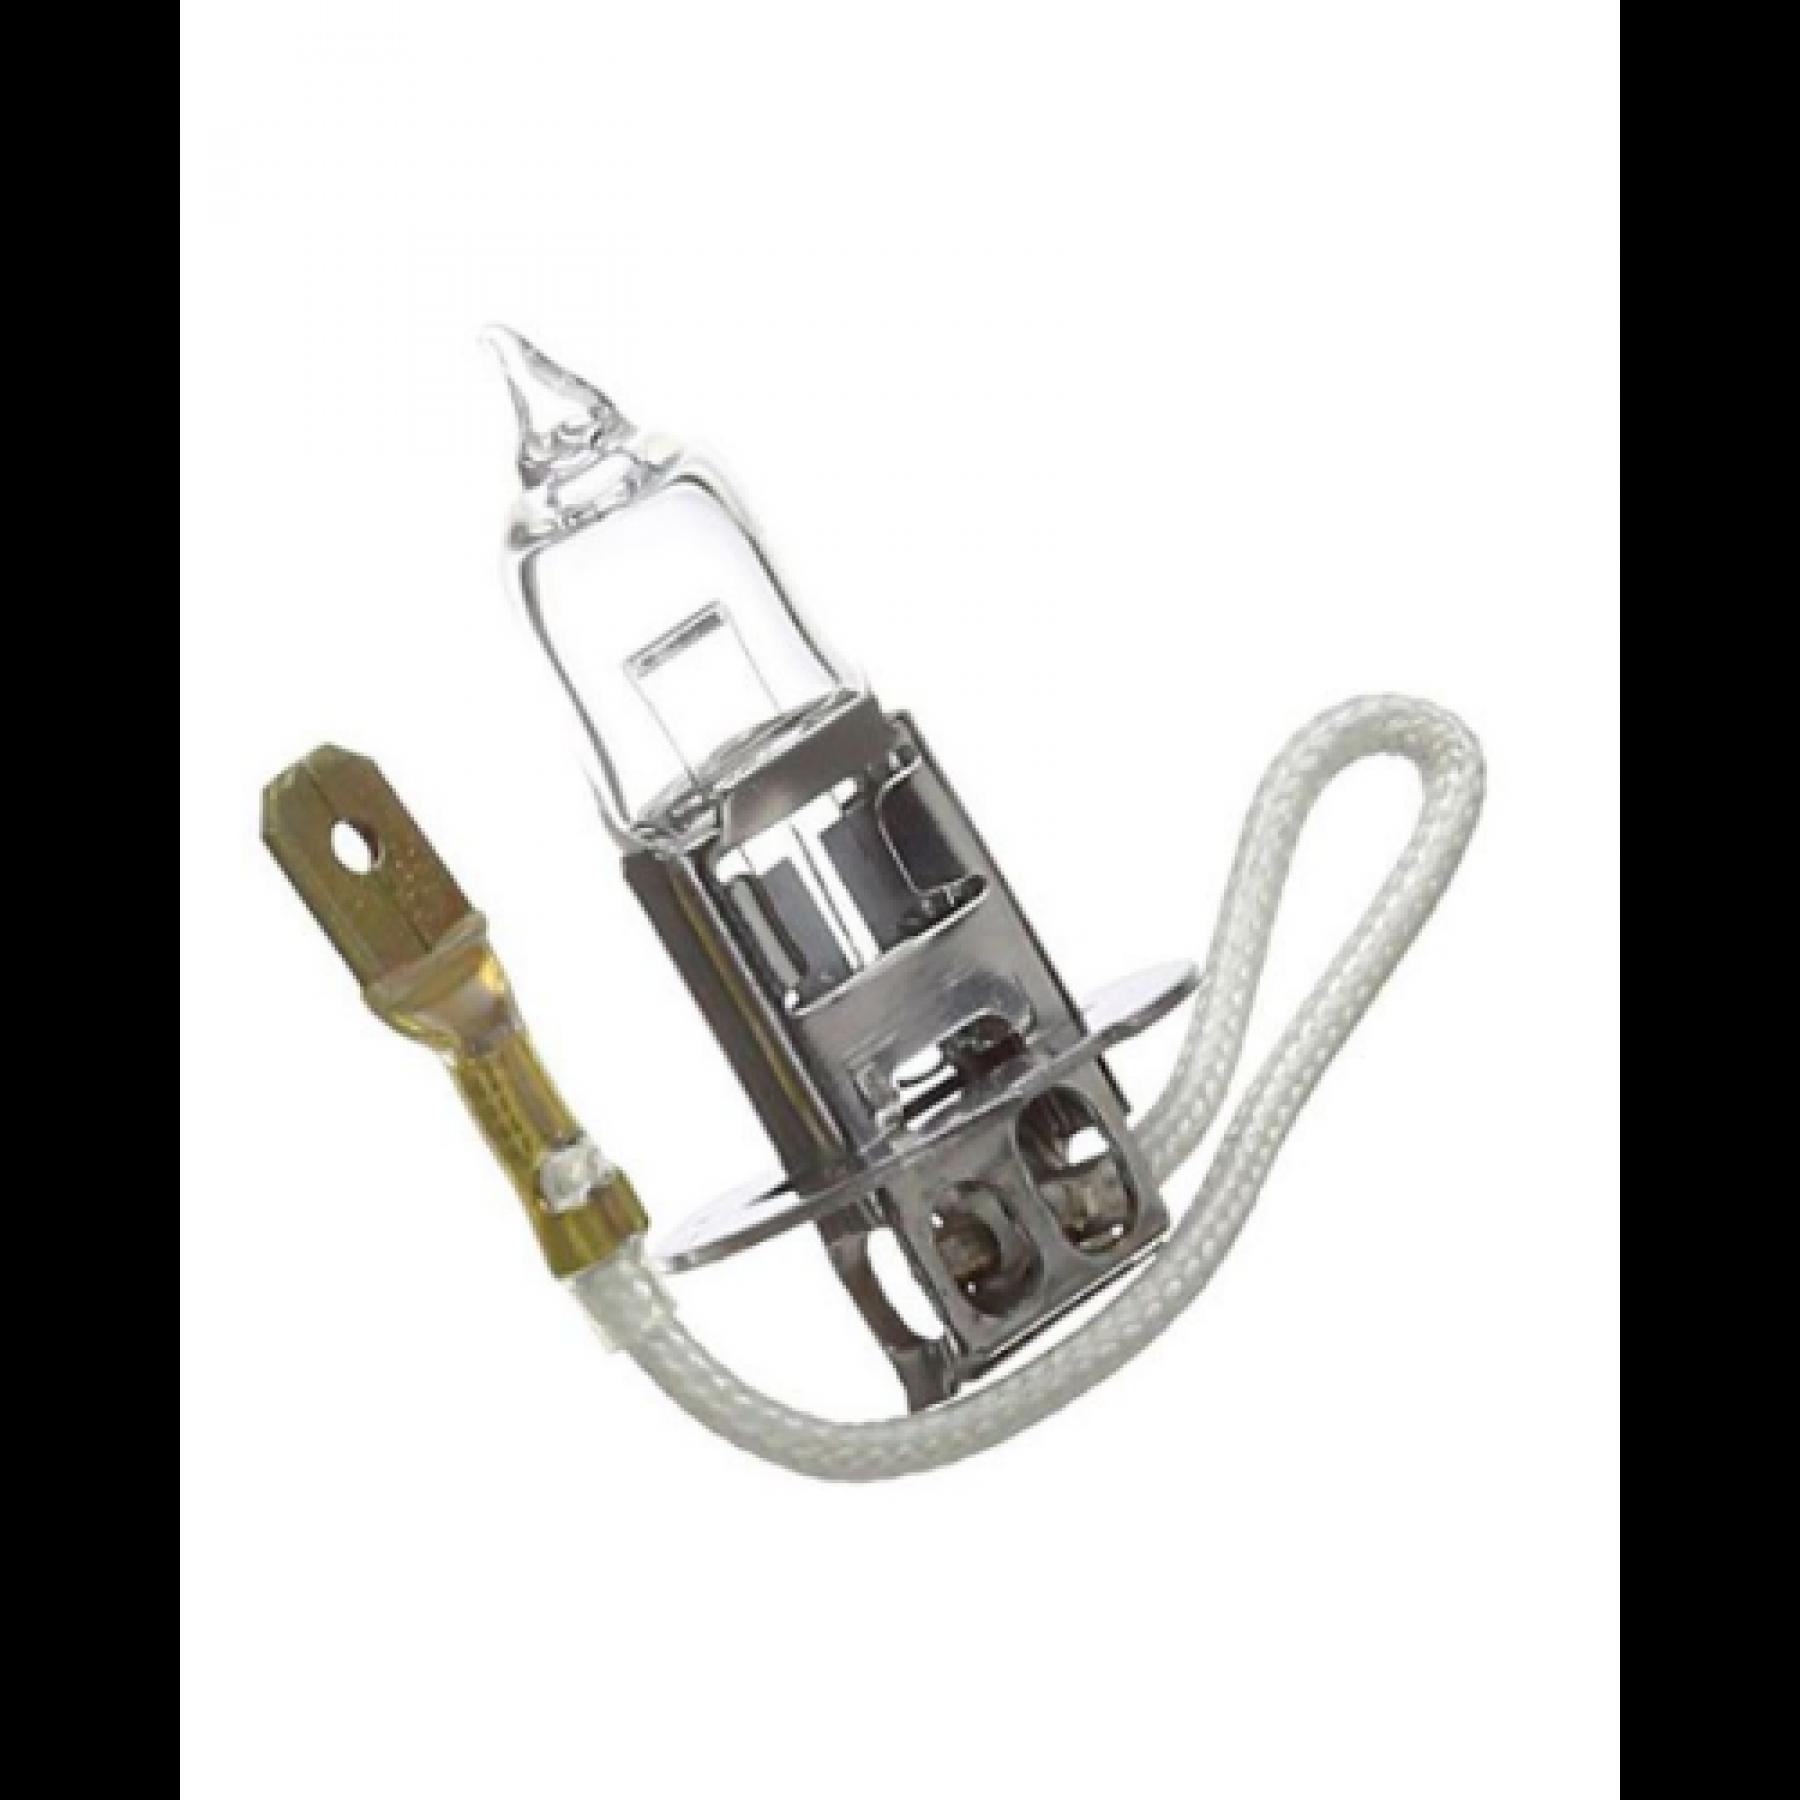 Gloeilamp Lamp 12V 100W H3 5012051 1638